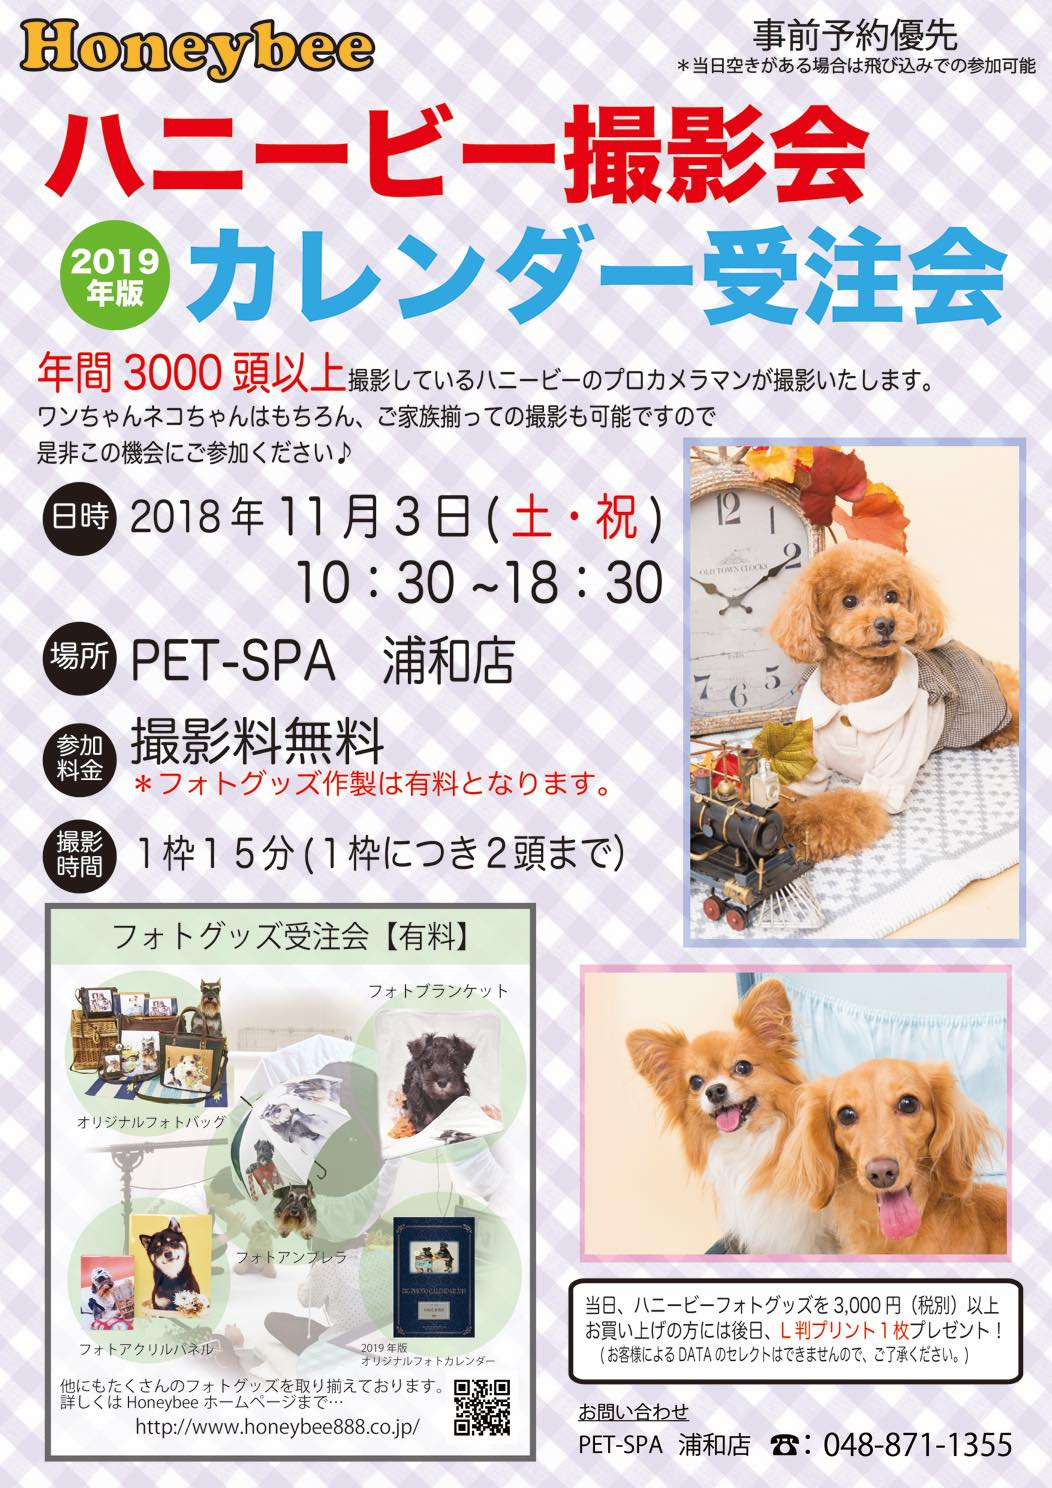 th_ハニービー撮影会_PET-SPA浦和店(11月)